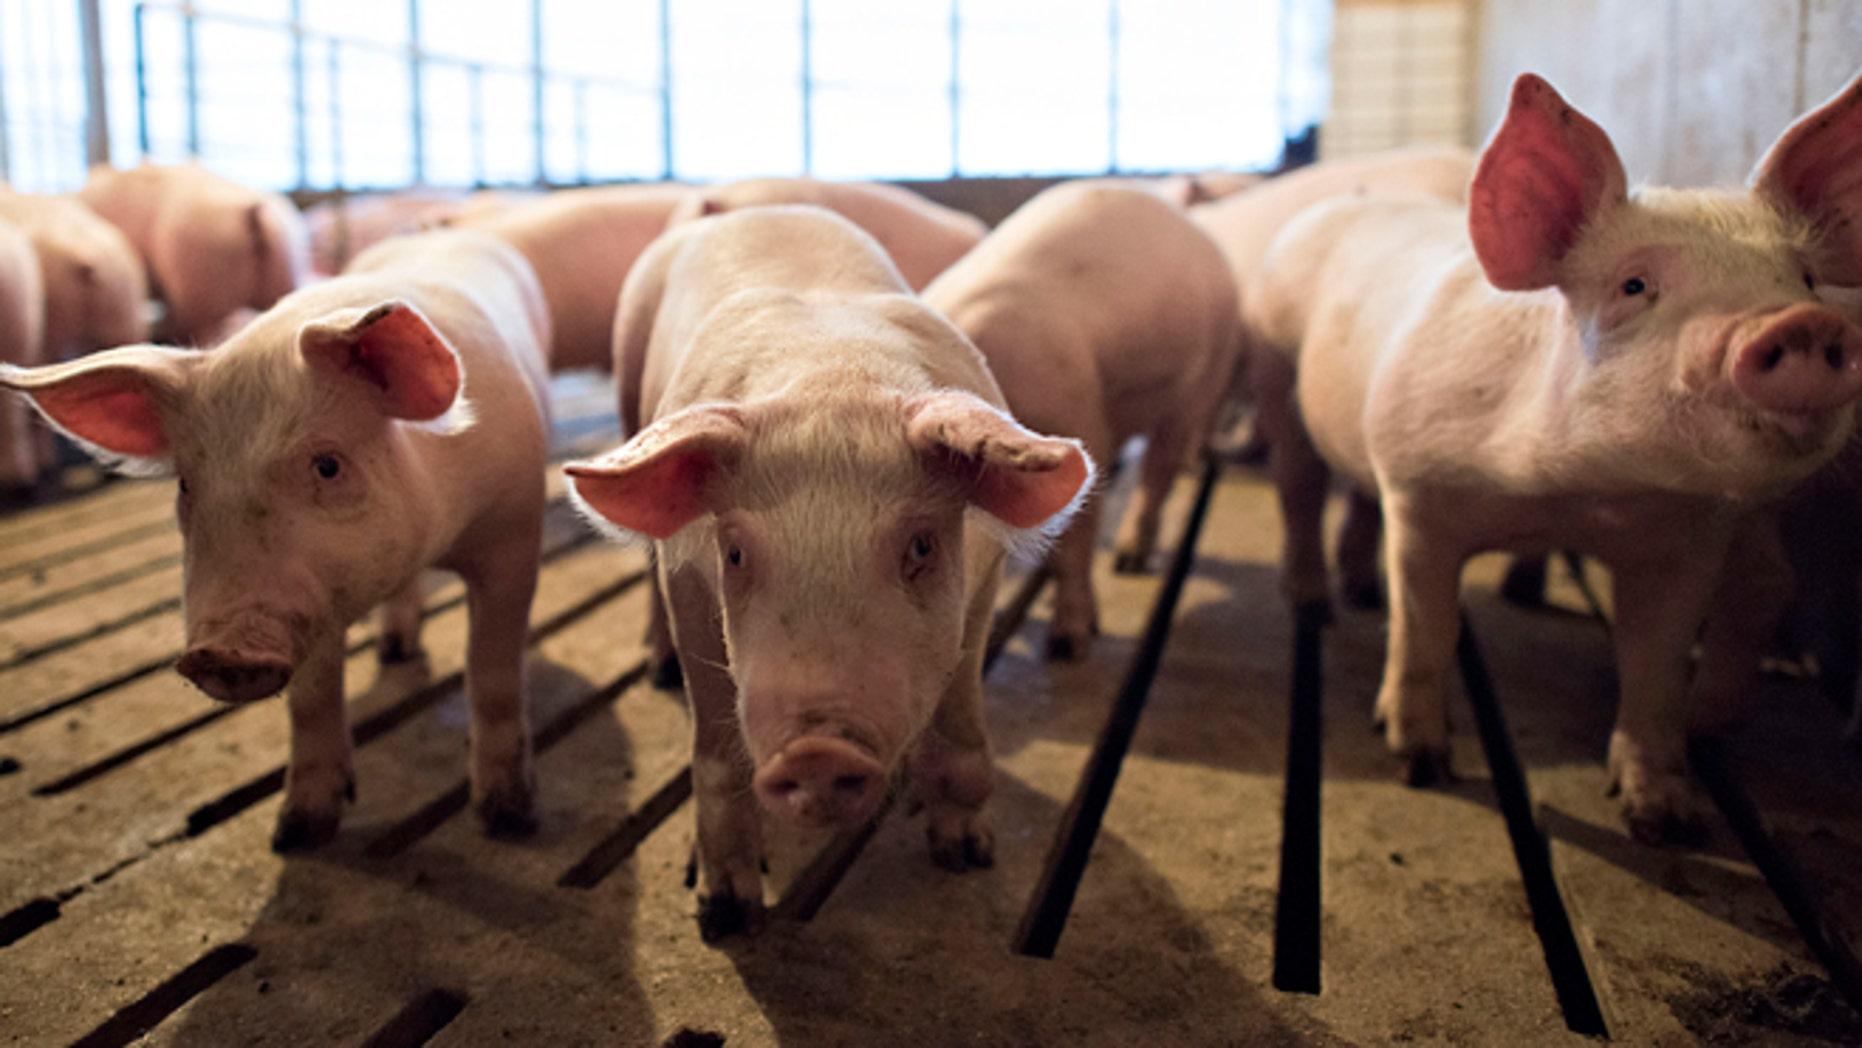 Nov. 19, 2014: Several-week-old pigs stand in a pen inside a barn at Paustian Enterprises in Walcott, Iowa. (Reuters)